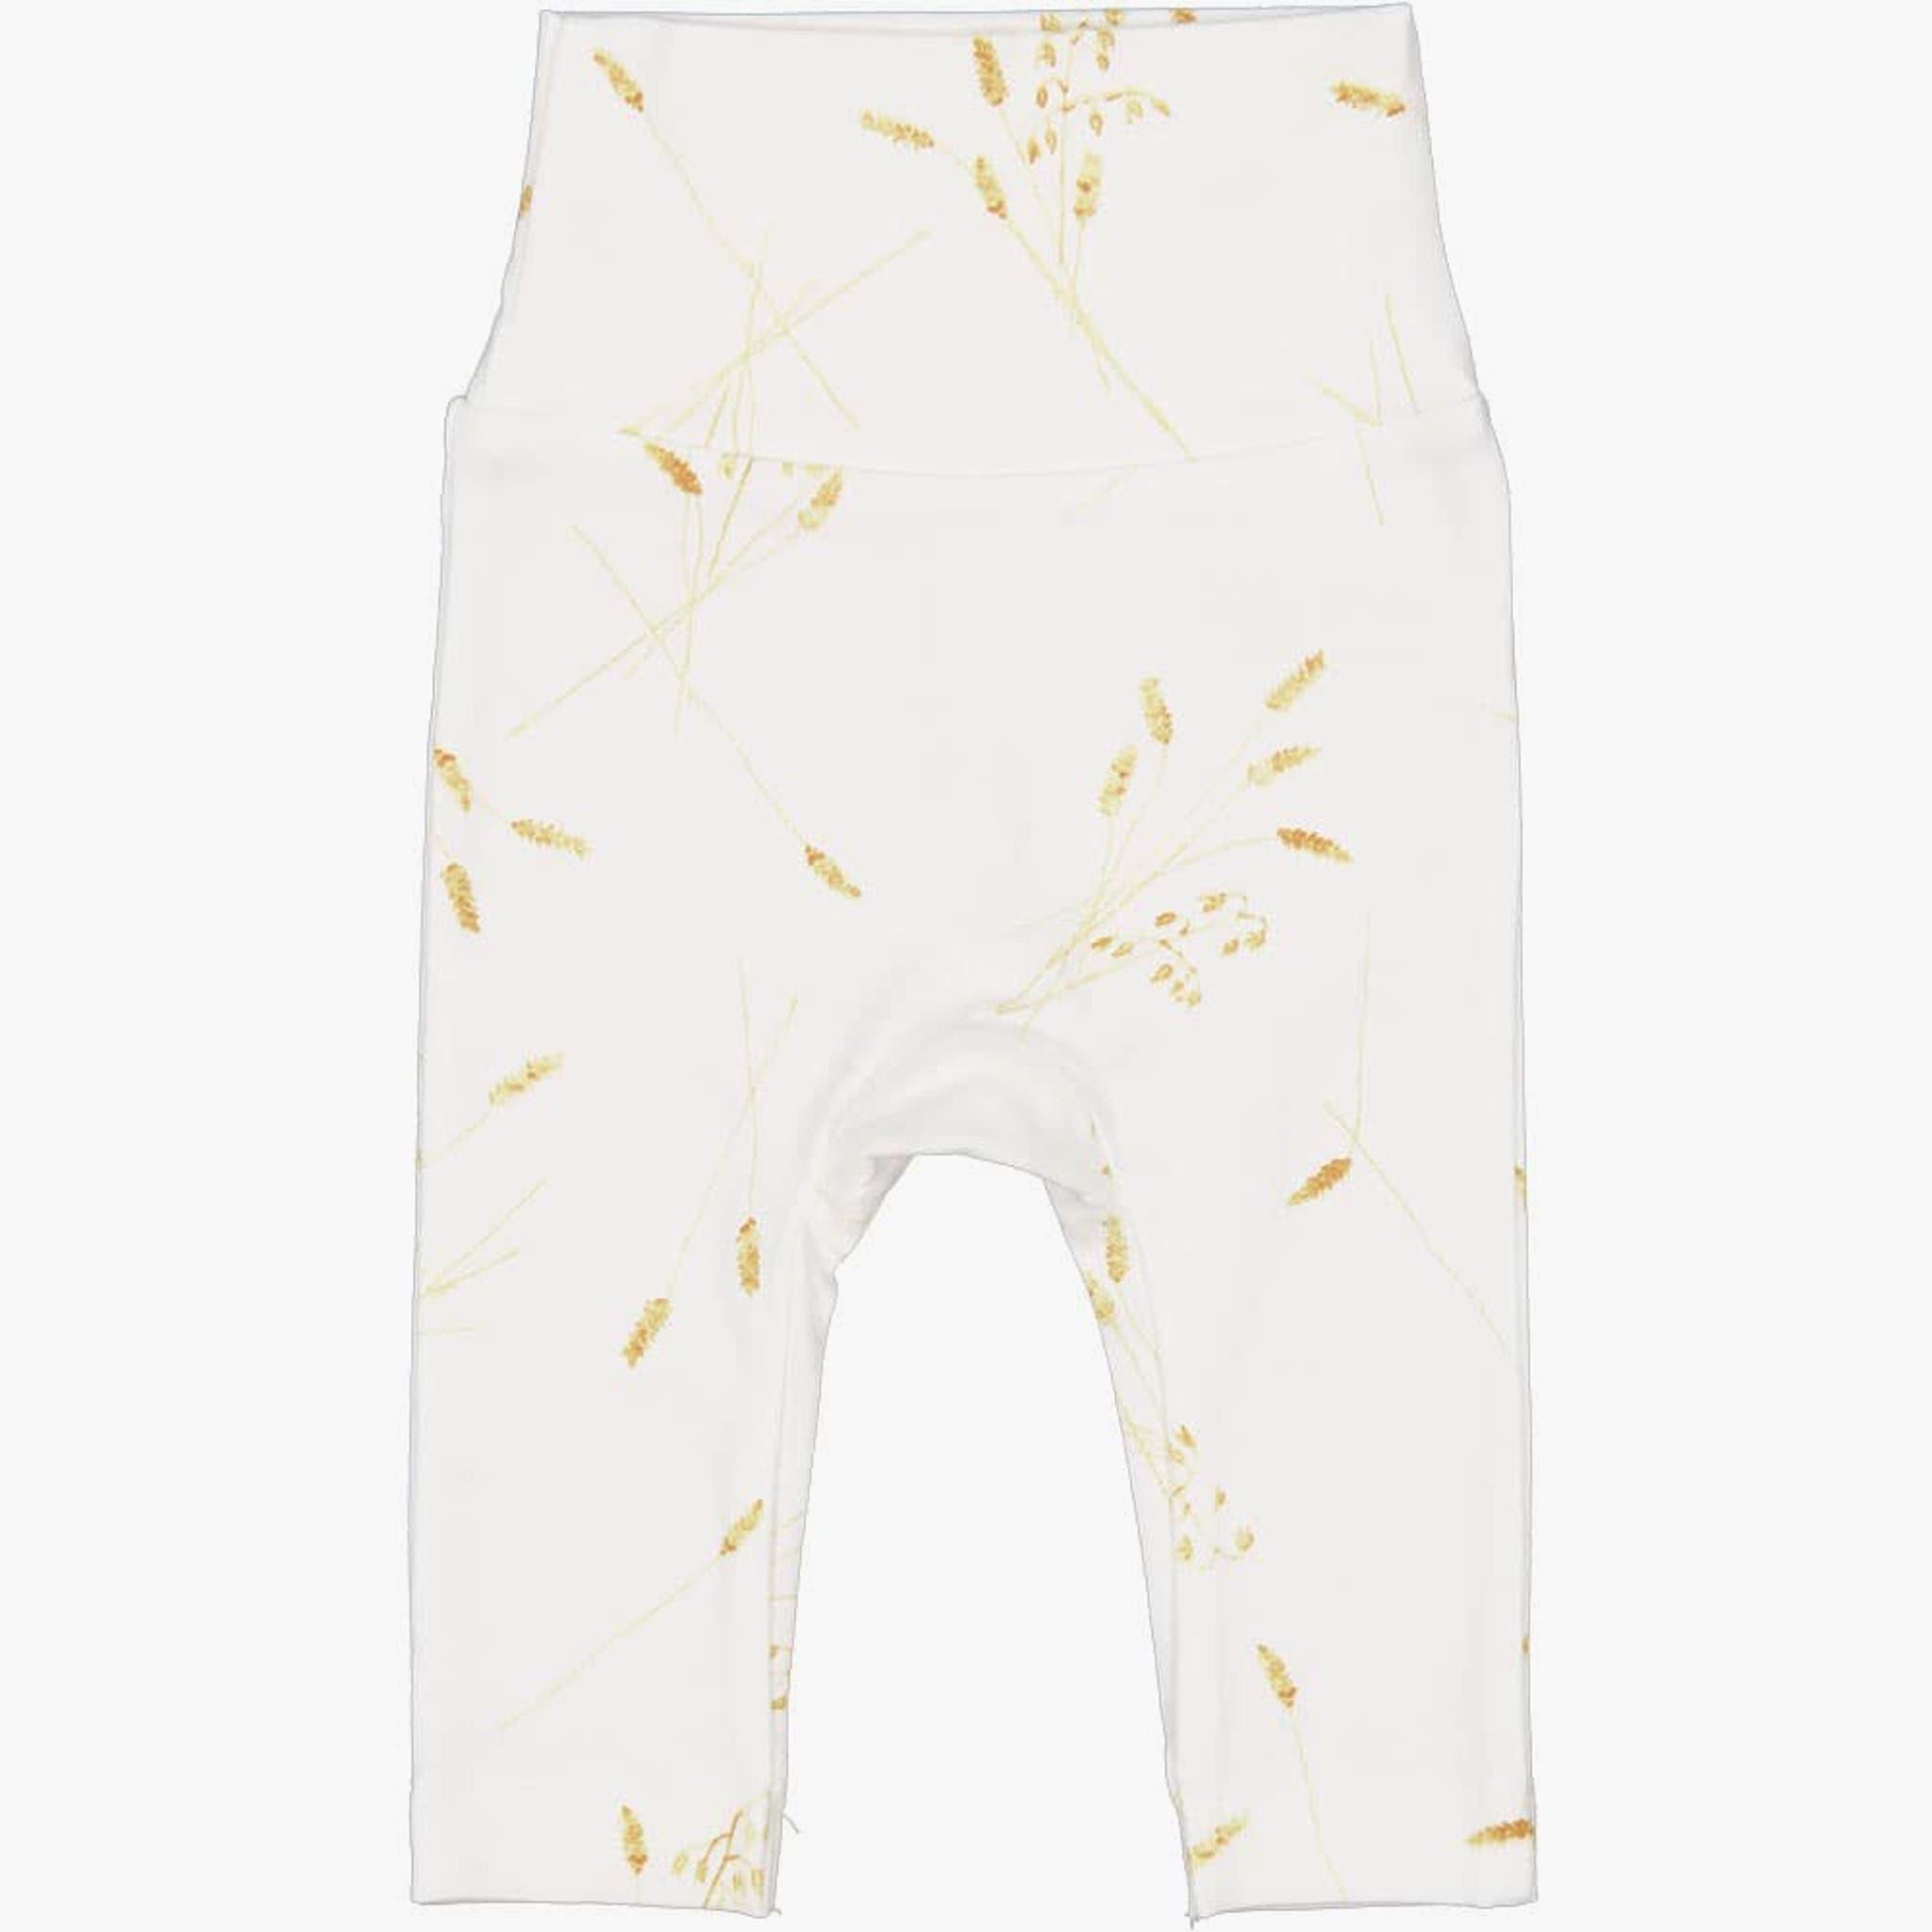 MarMar - Piva Pants - cornfield